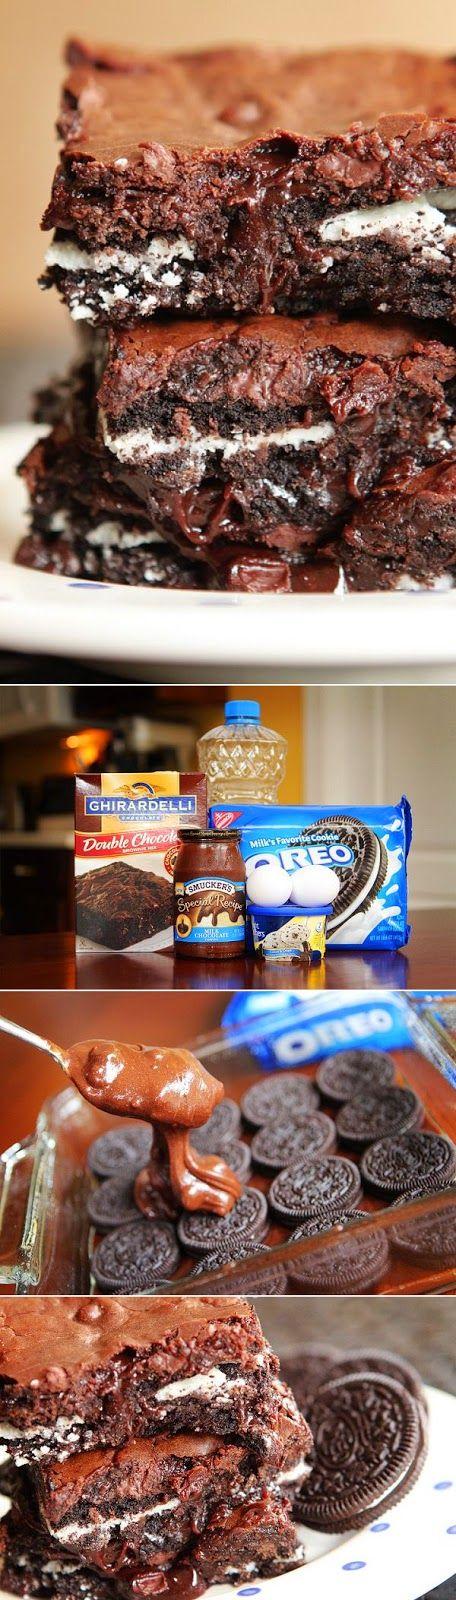 Cookies 'N Cream Oreo Fudge Brownies. #delicious #recipe #cake #desserts #dessertrecipes #yummy #delicious #food #sweet